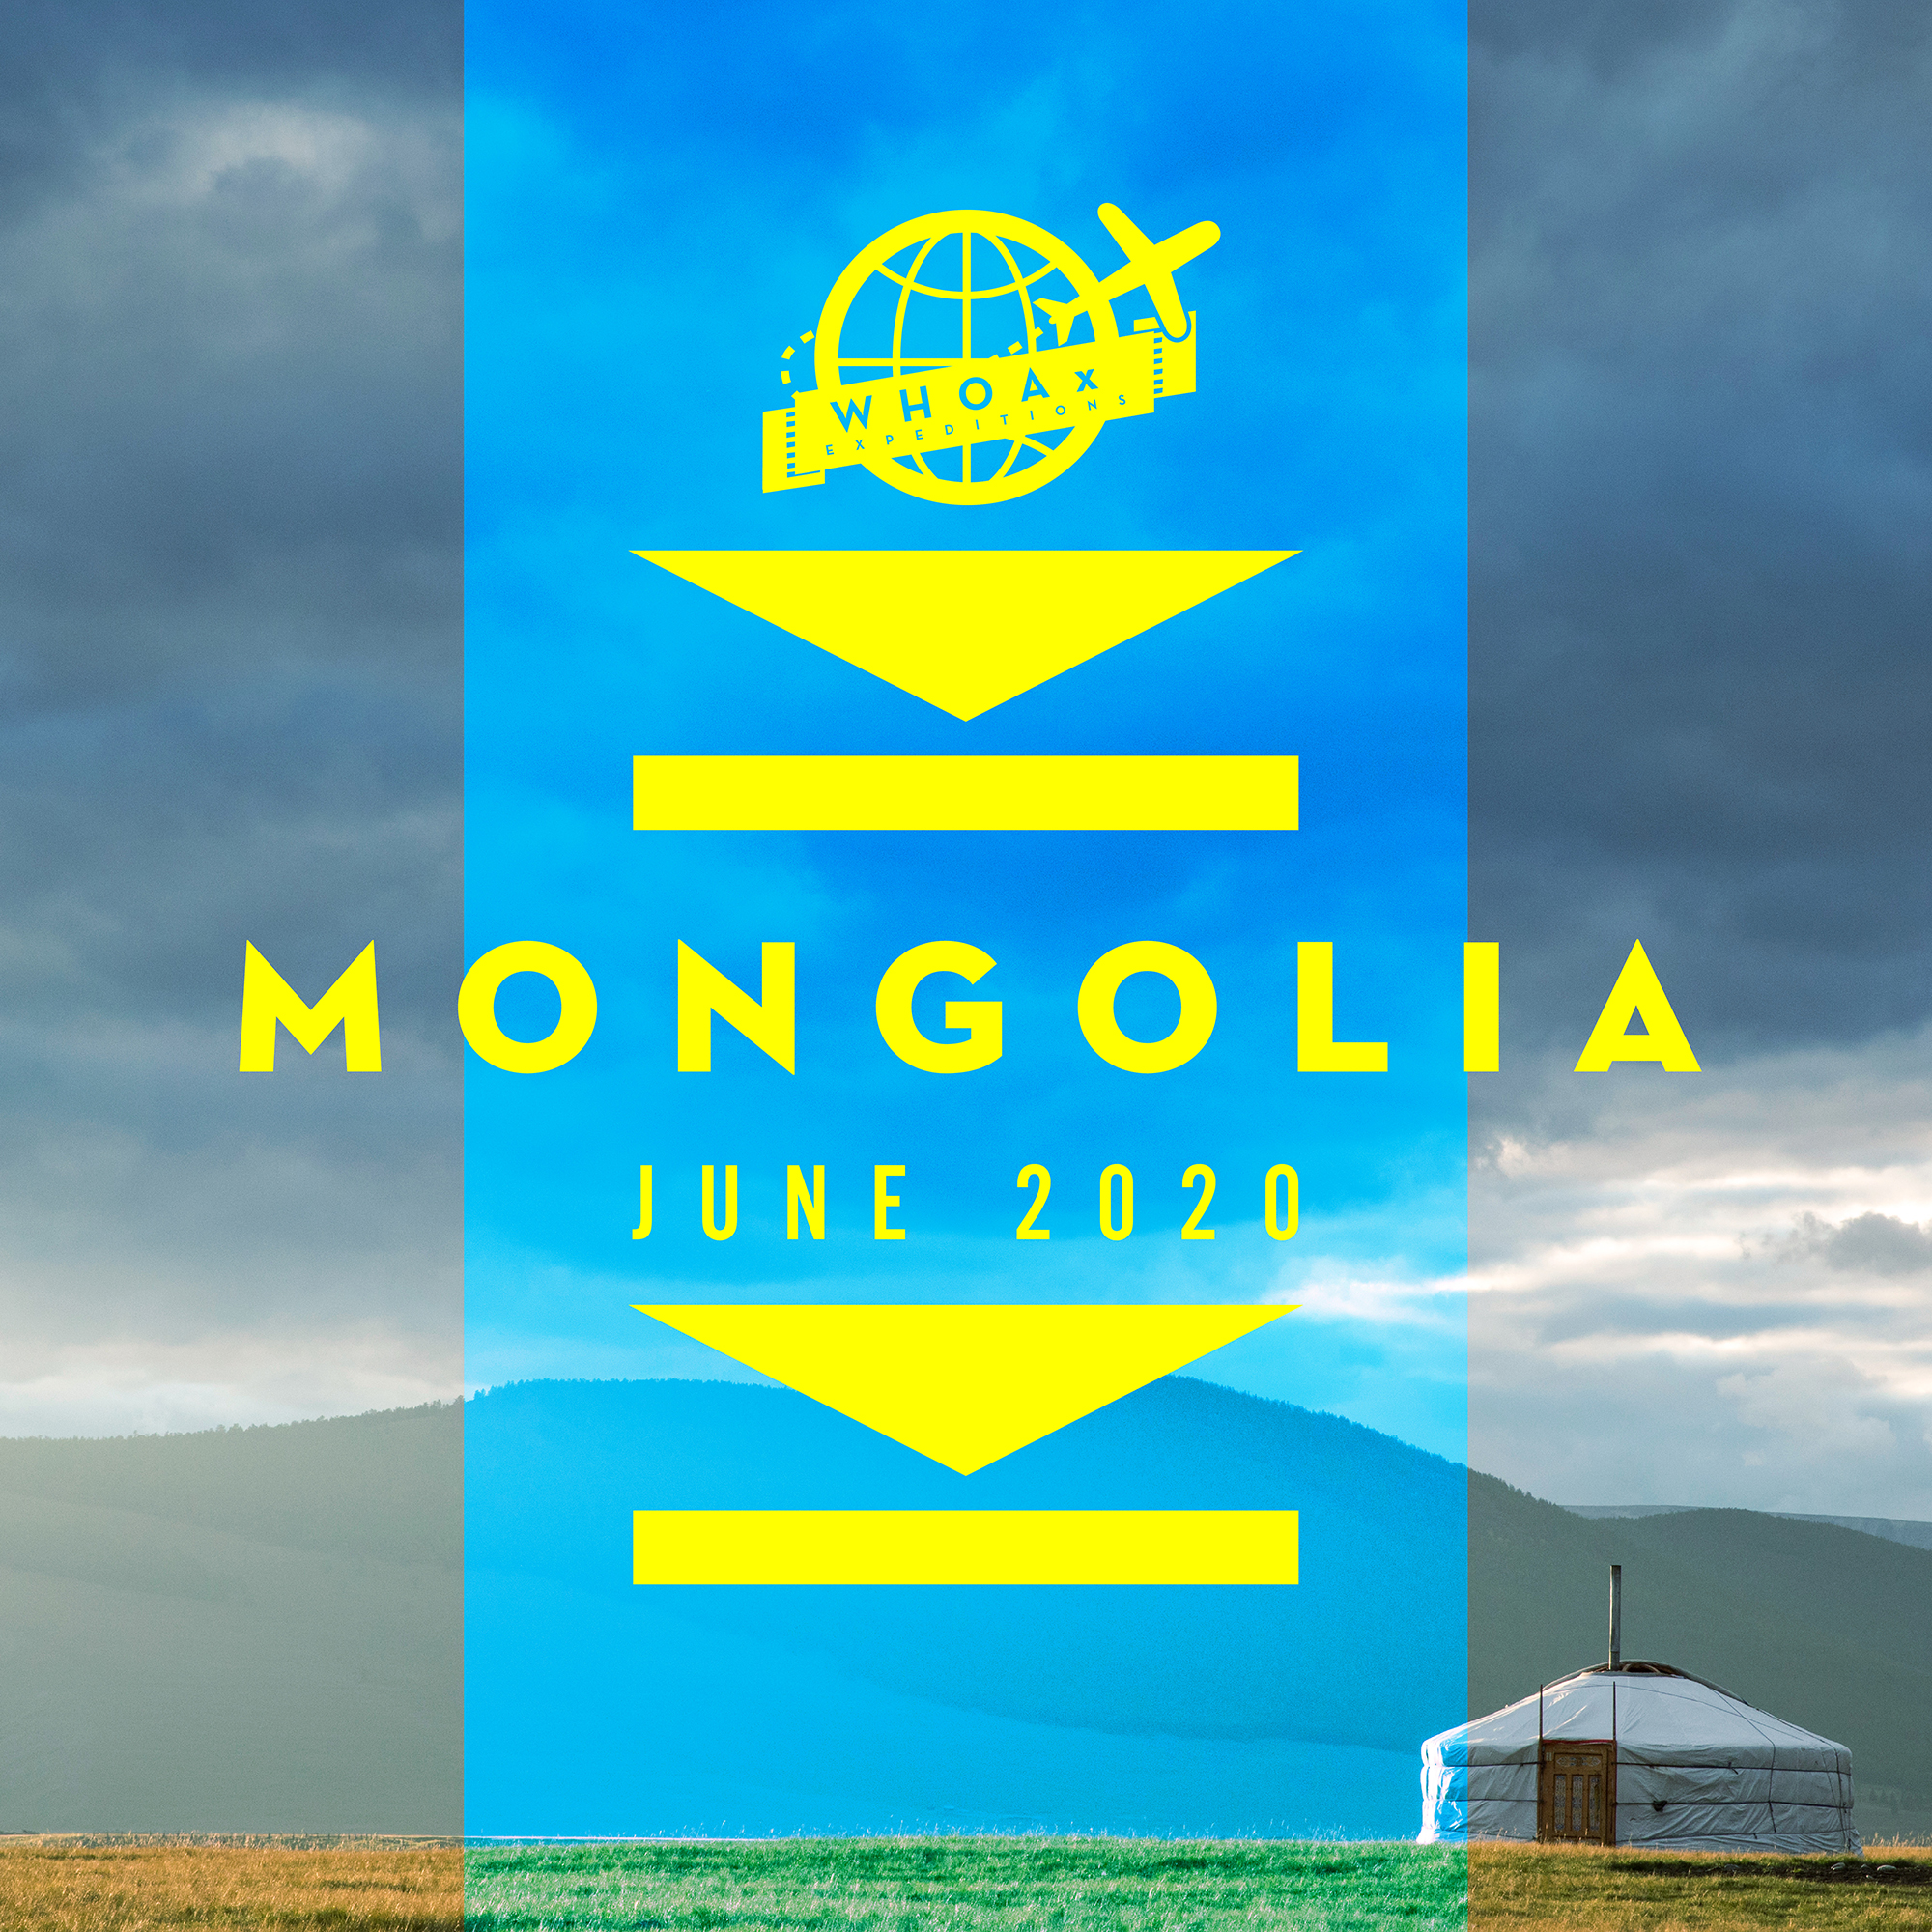 JUNE 22 - JULY 3 - 2020WHOAx: MONGOLIA $3,750